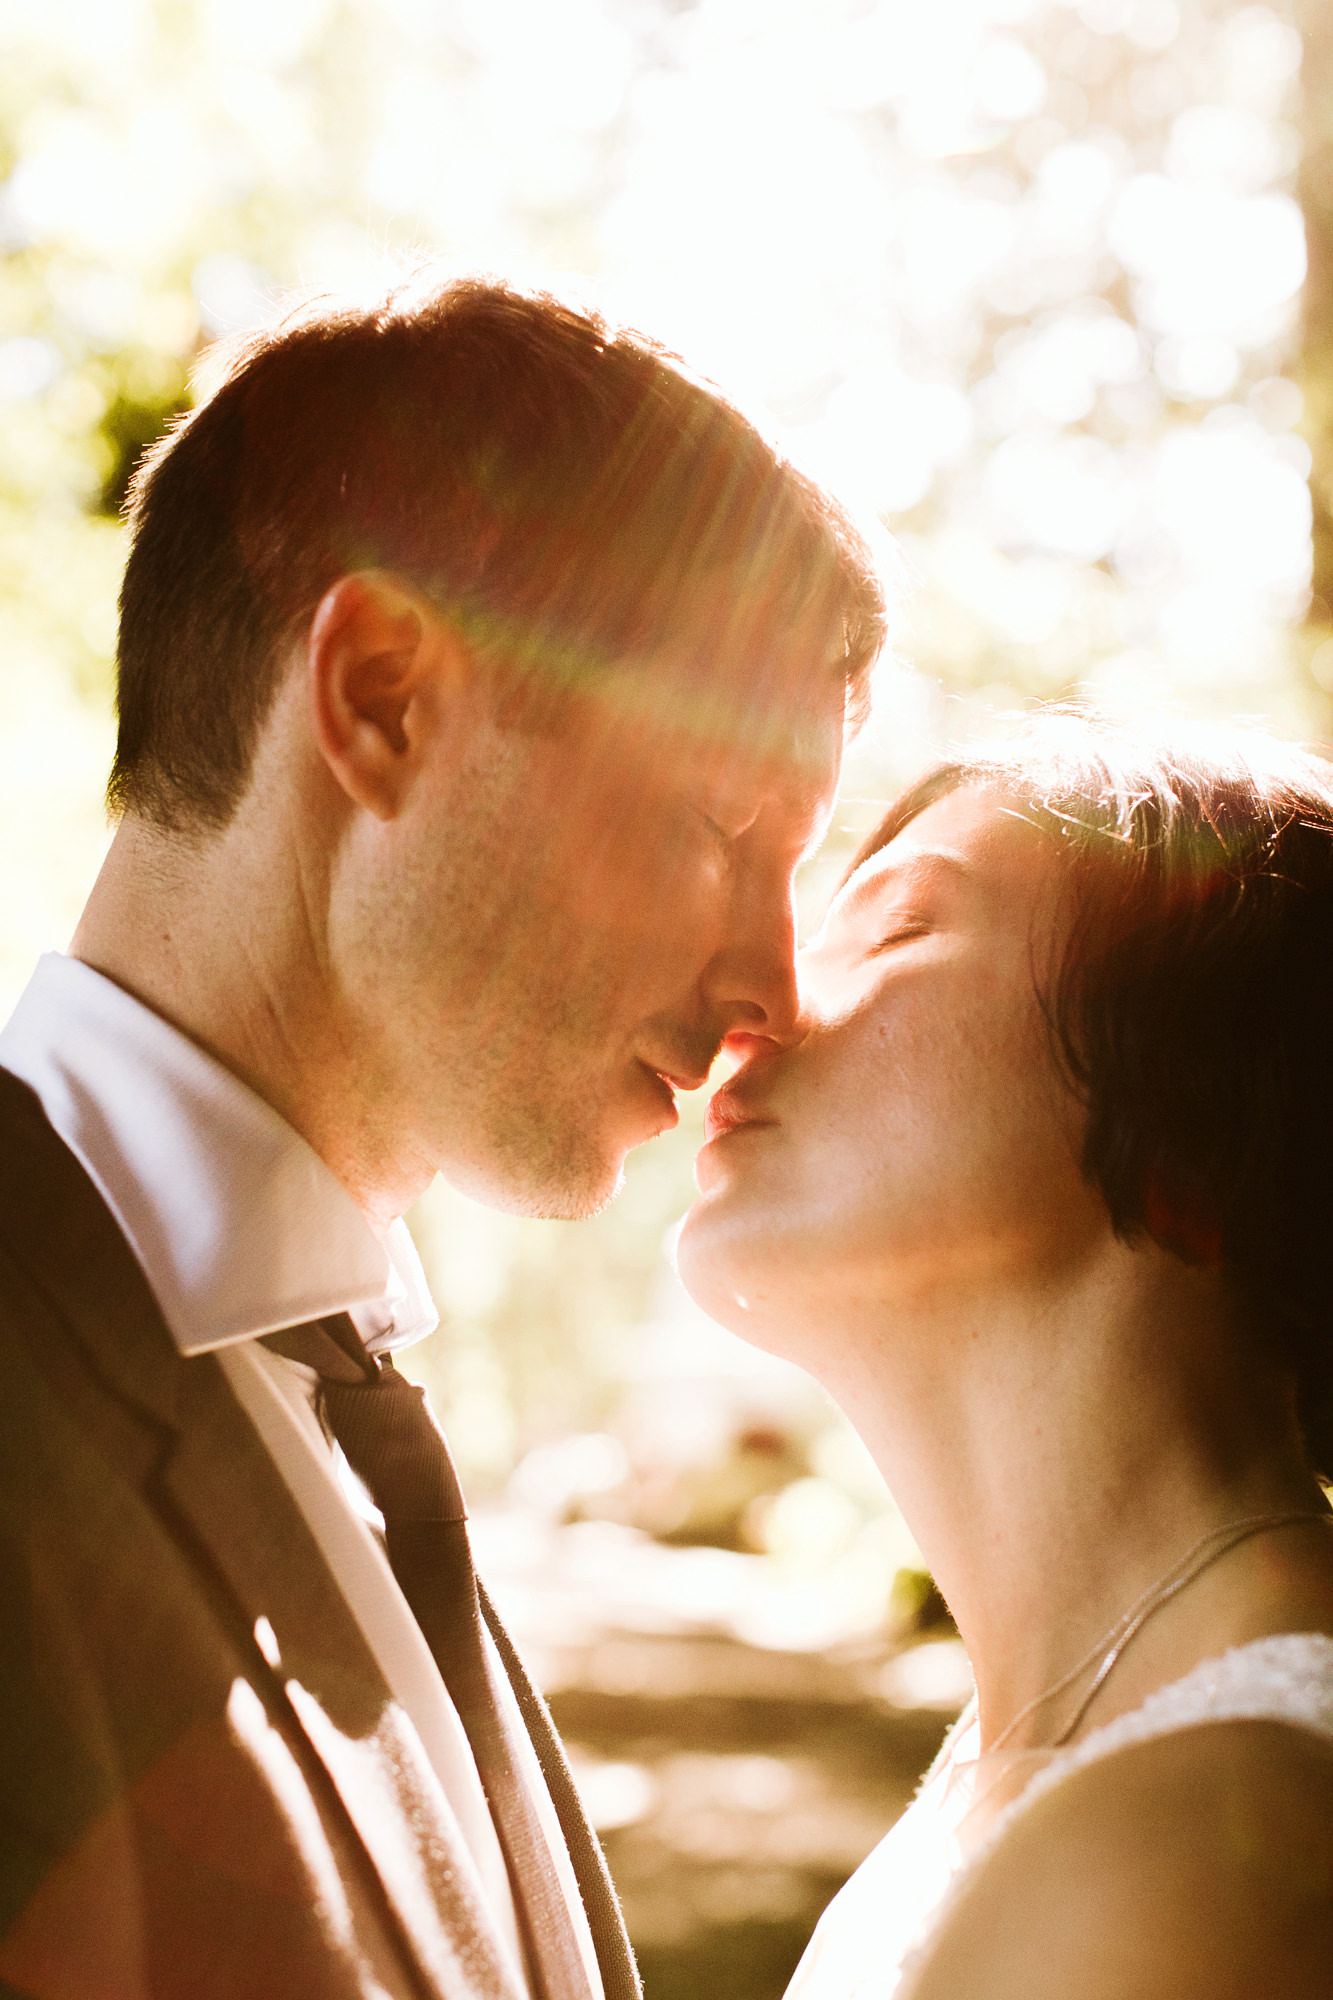 California-wedding-photographer-alfonso-flores-pamplin-groove-282.jpg